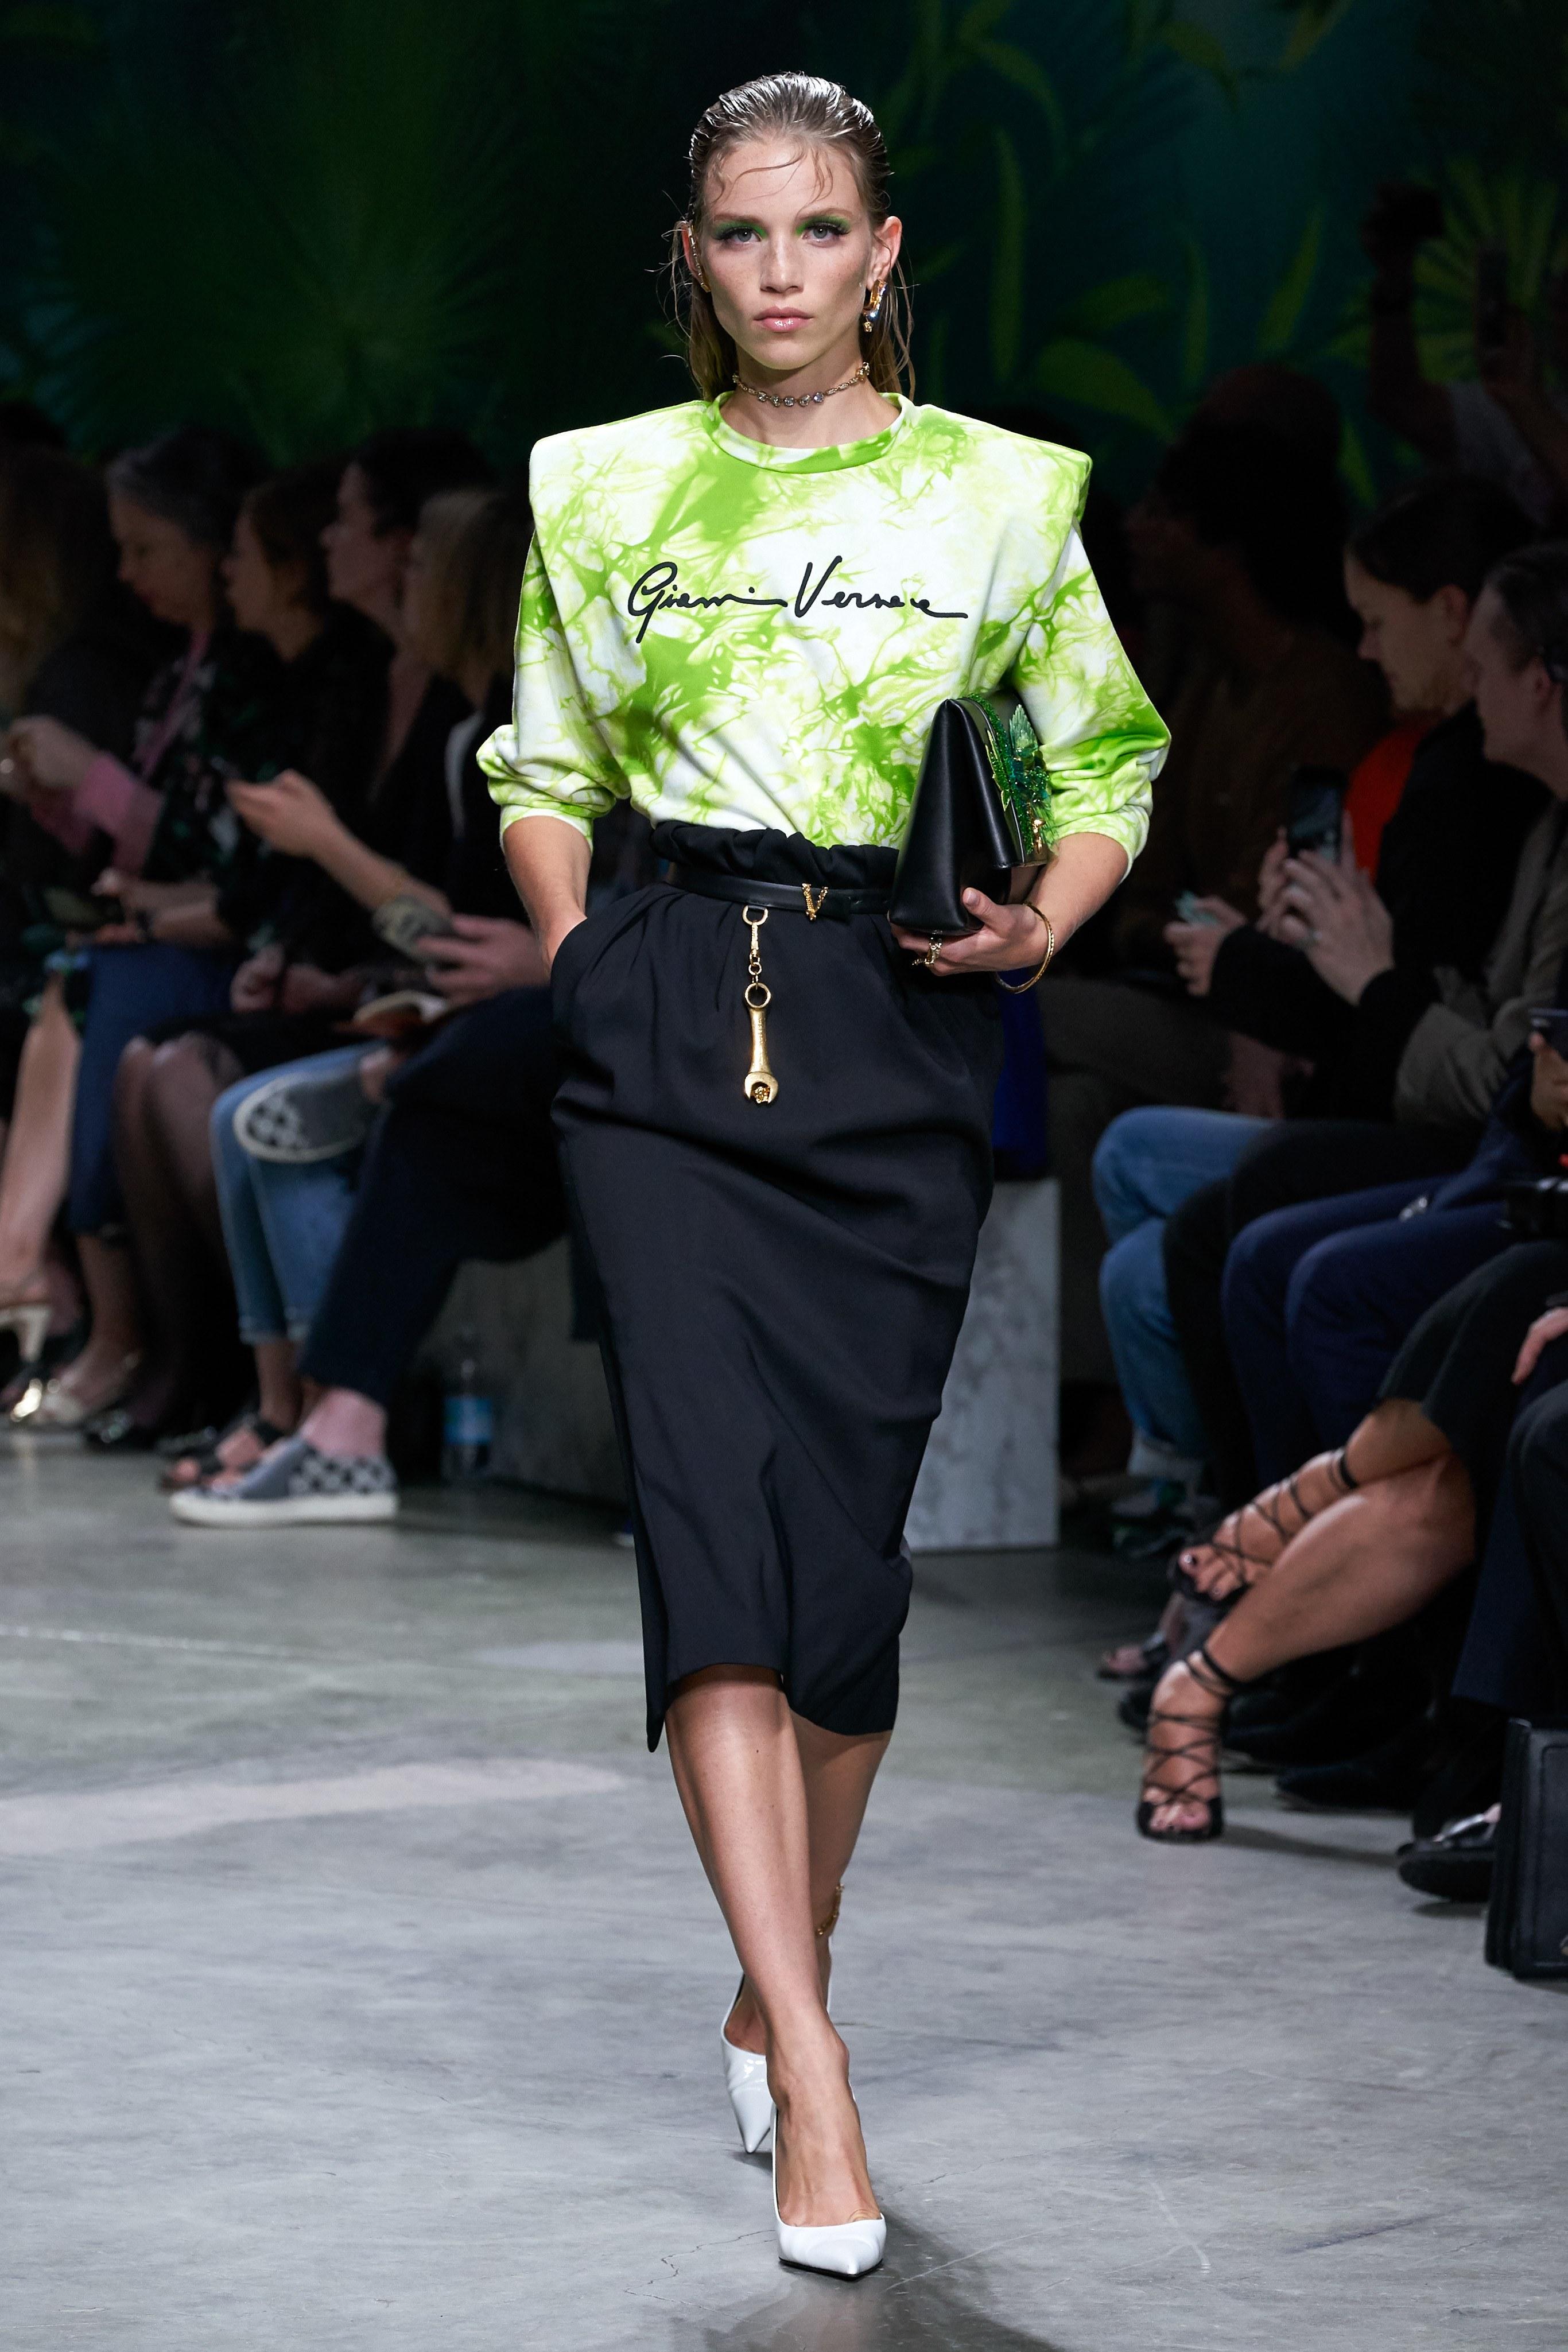 versace mfw jennifer lopez jungle sexy dress 2020 ss throwback